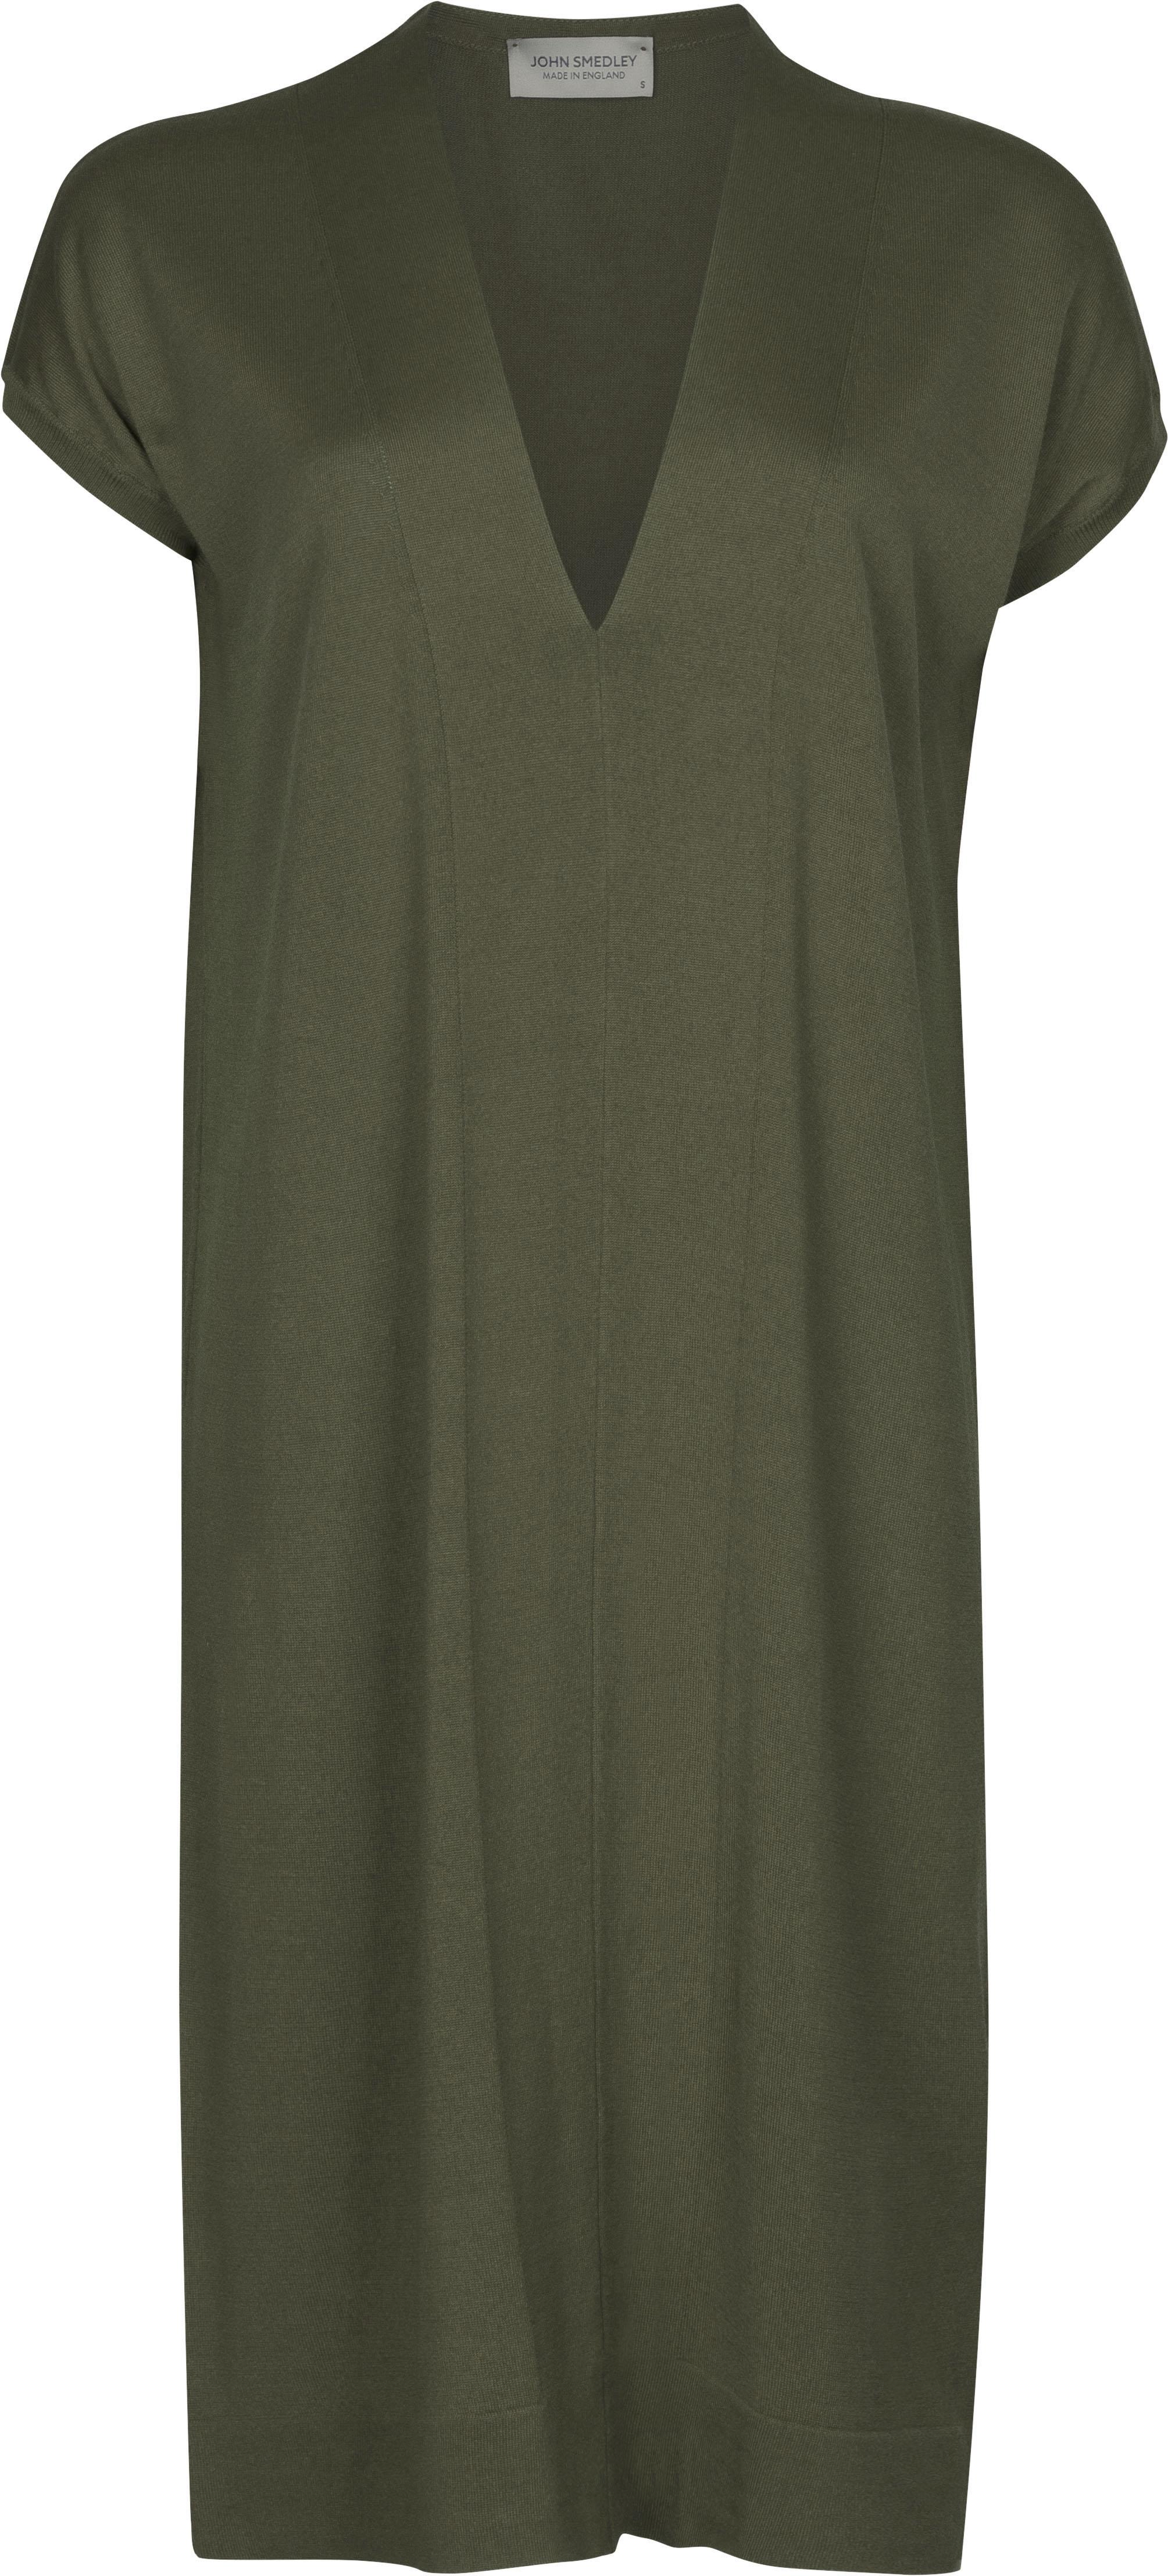 John Smedley Burdine in Sepal Green Dress-LGE